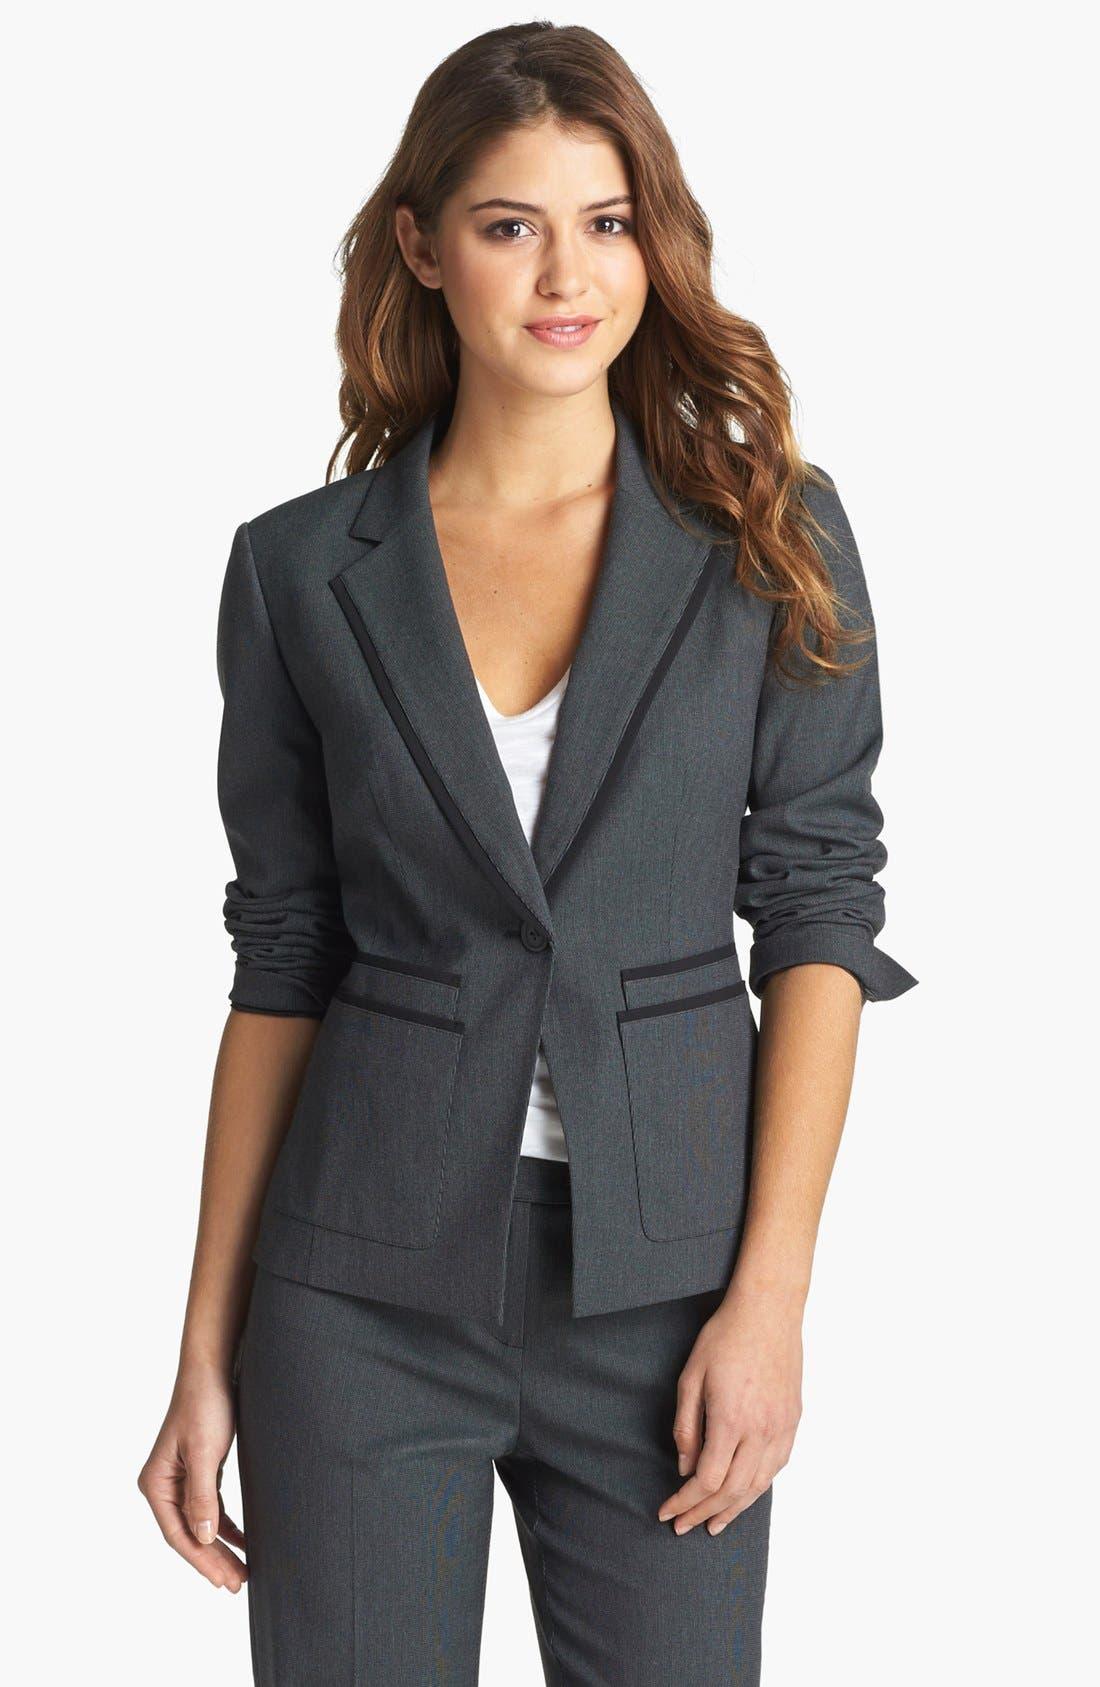 Alternate Image 1 Selected - Halogen® 'Fox Hunt' Suit Jacket (Regular & Petite)